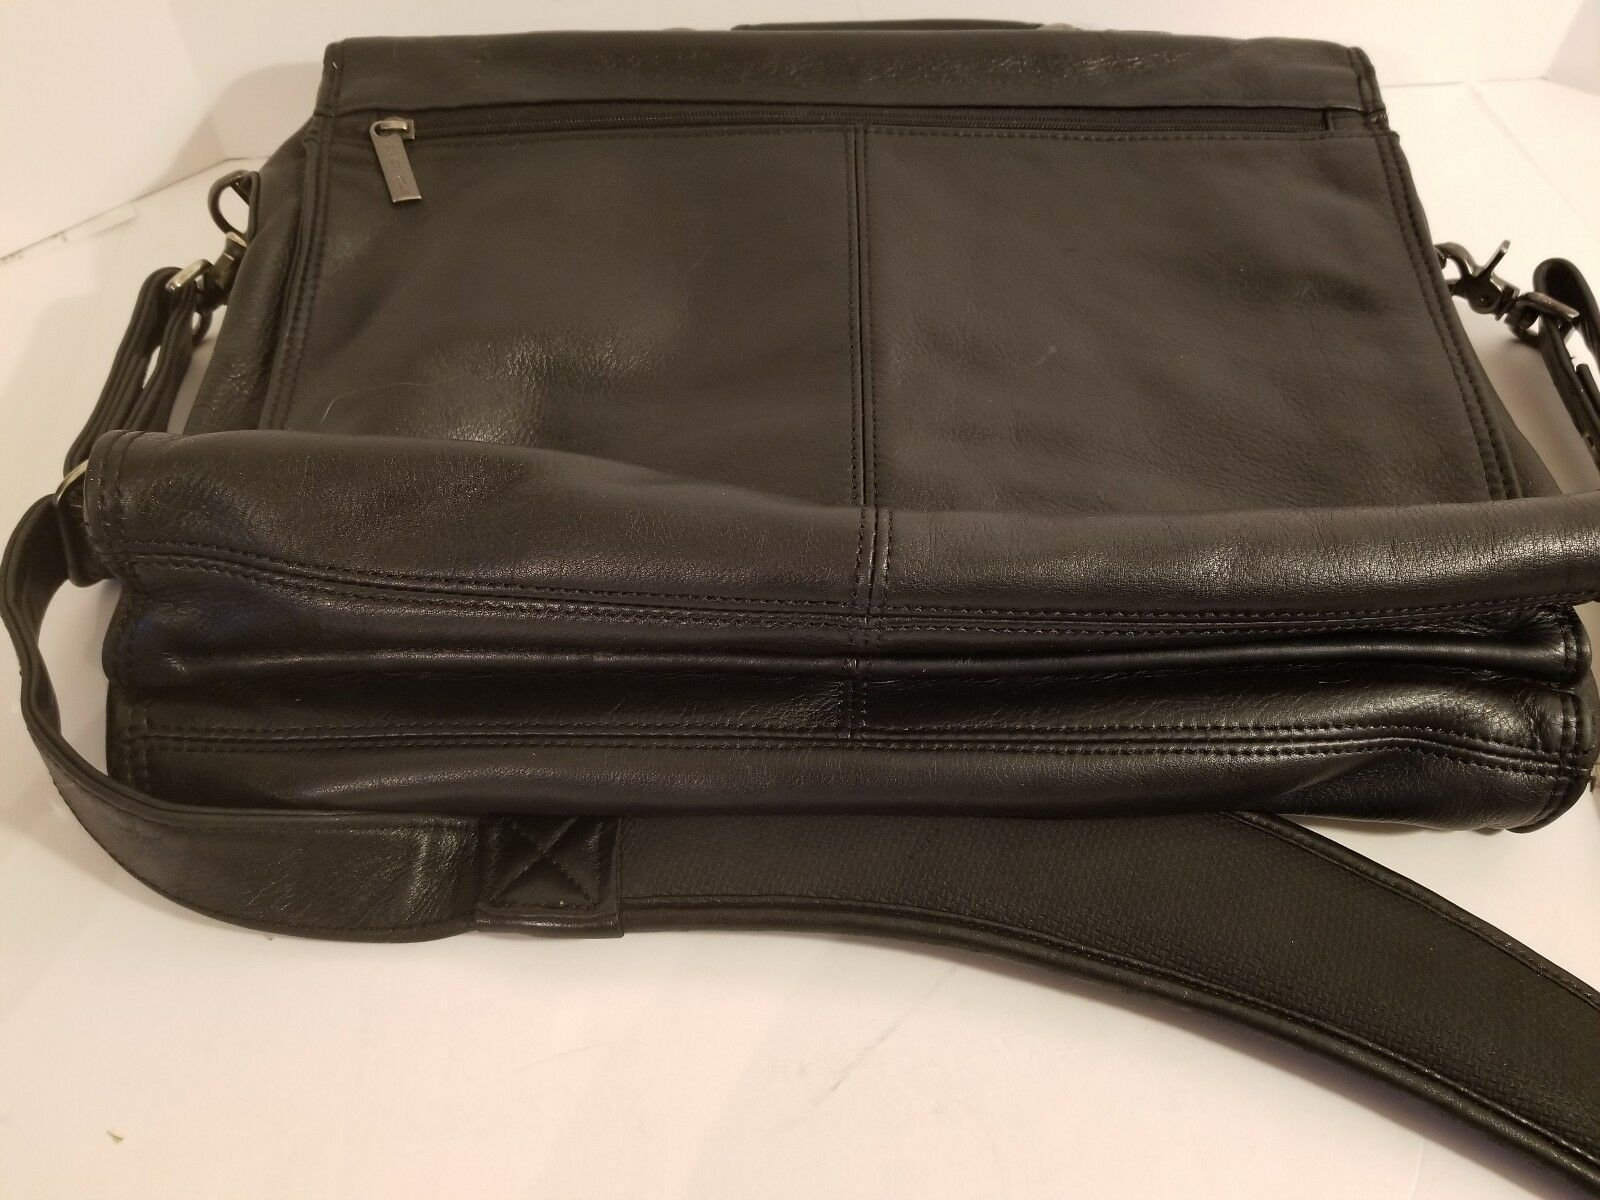 bff4c2c05 Kenneth Cole Manhattan Leather Messenger Briefcase Laptop Bag Black 520265  for sale online | eBay